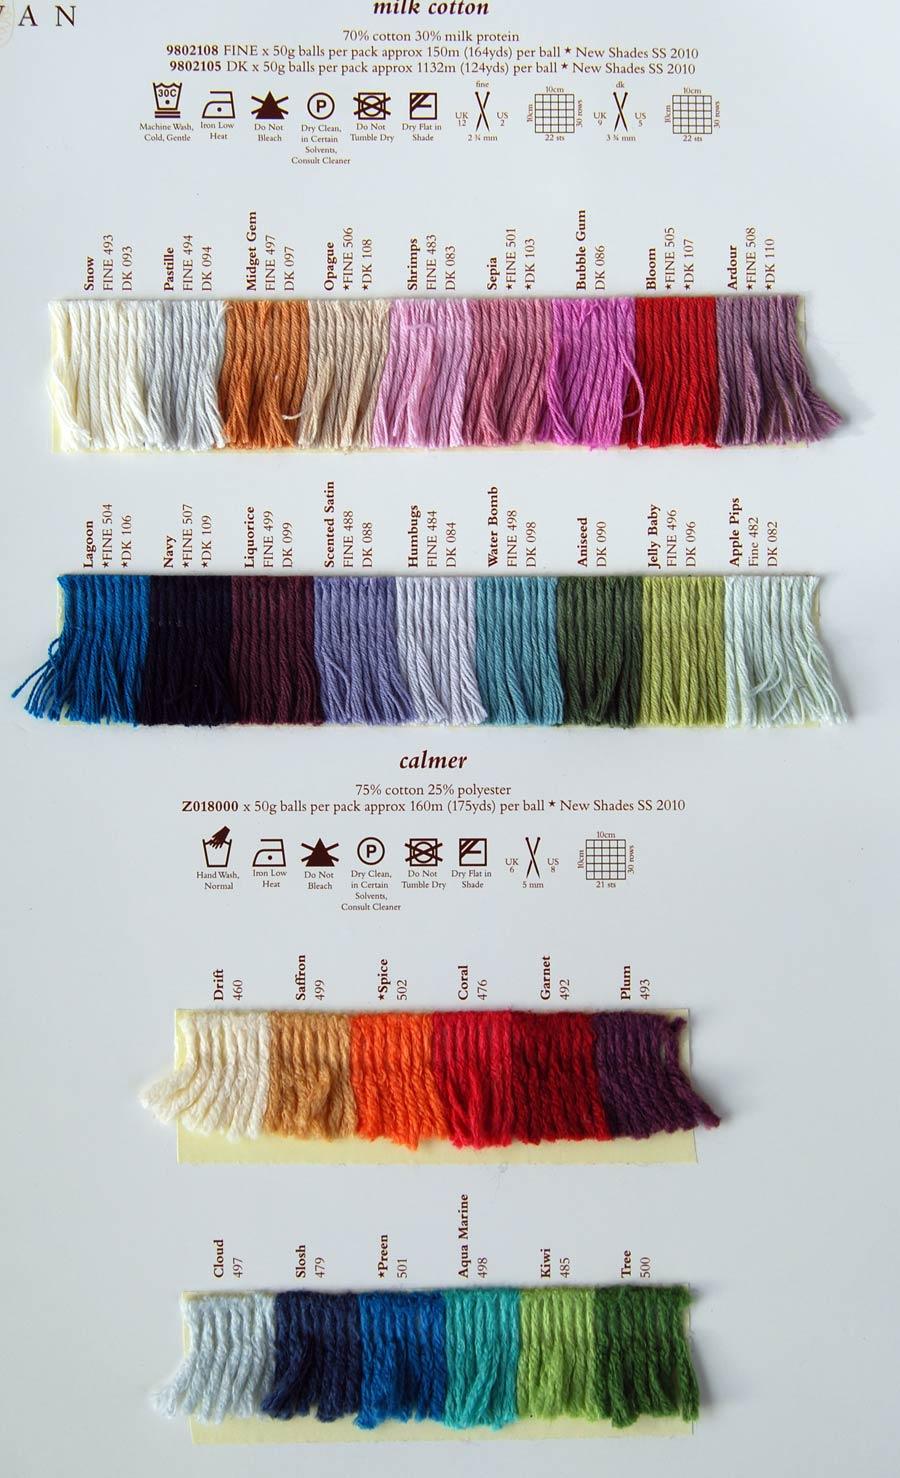 Knitting Patterns Rowan Wool Cotton : Rowan Milk Cotton DK - Rowan Yarns RYC Sirdar Sublime English Yarns knitting ...